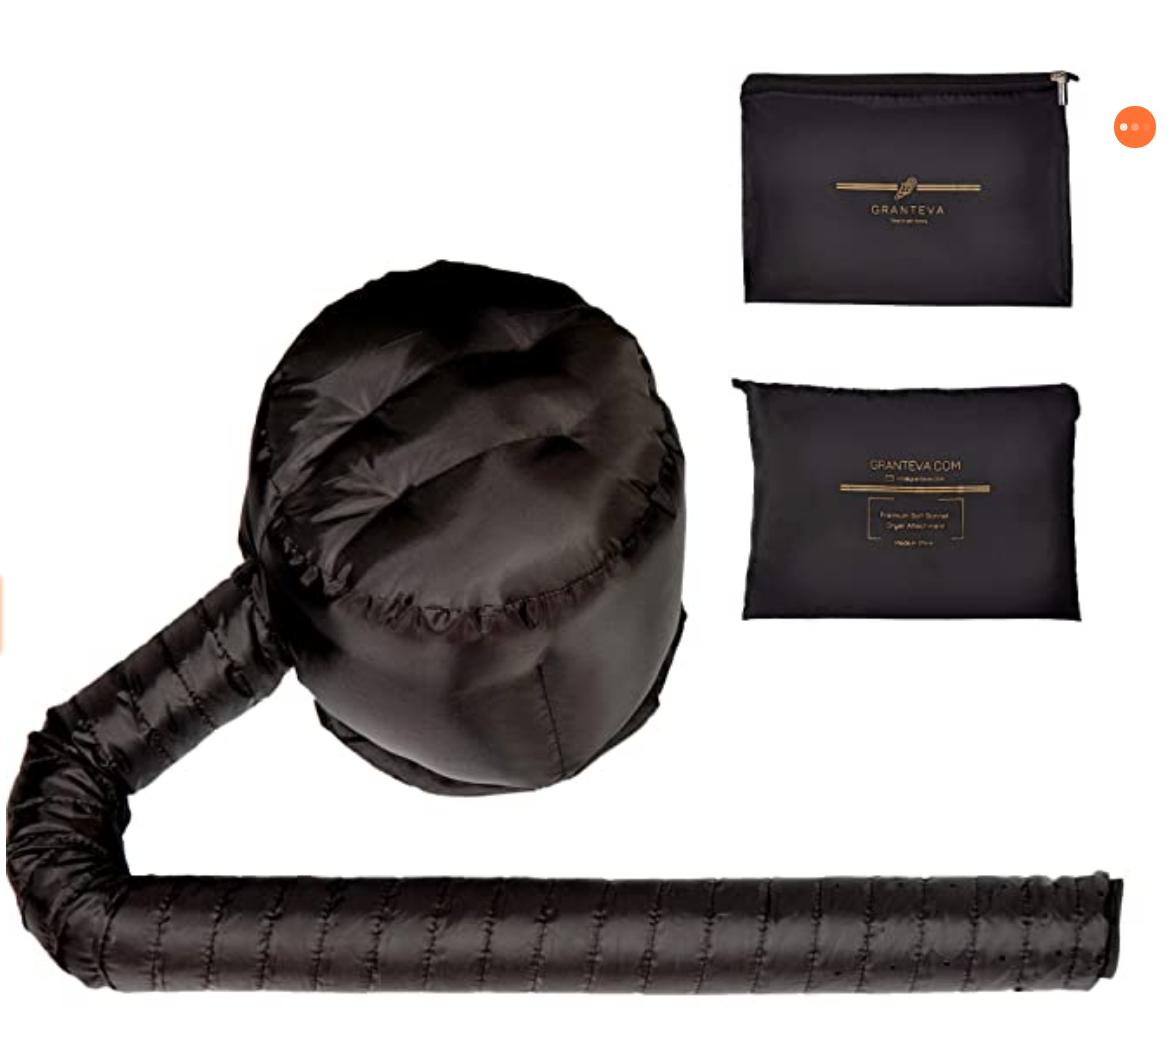 Bonnet hood dryer attachment